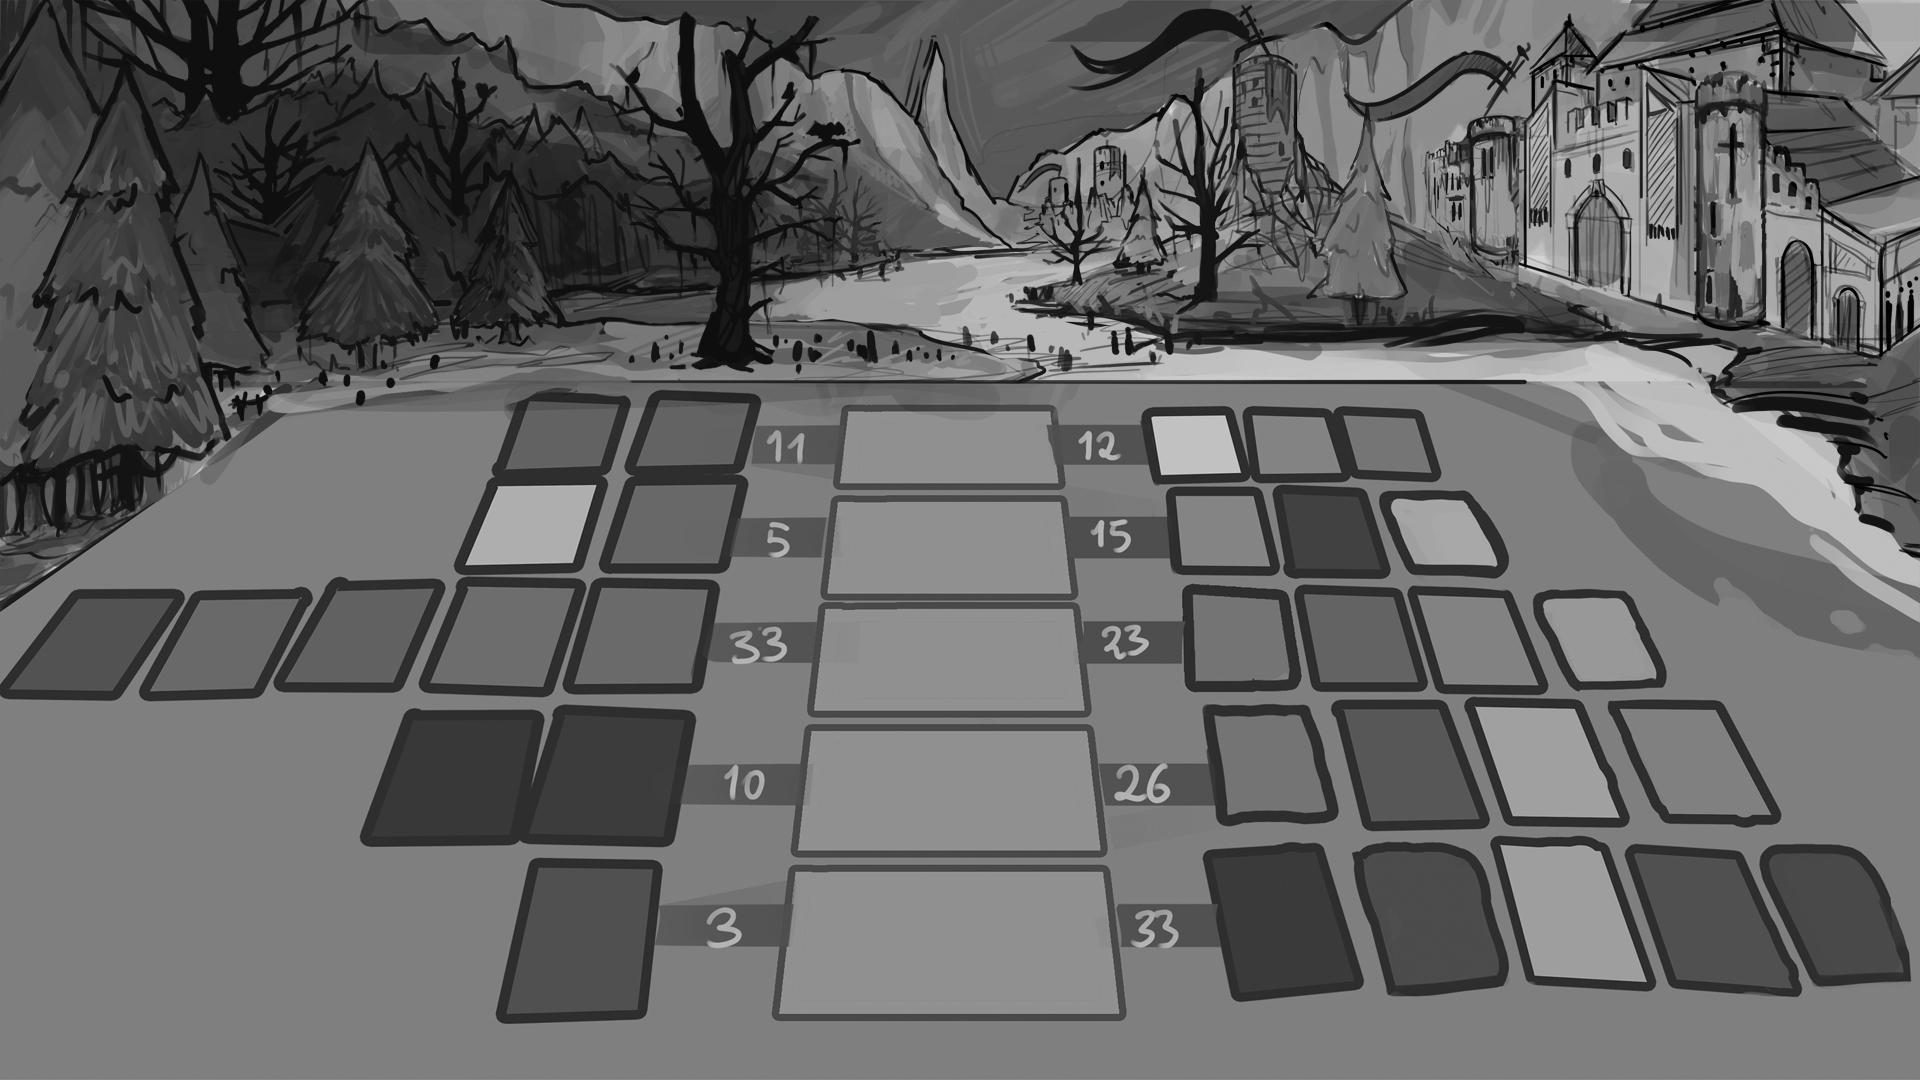 Chronica screen concept art